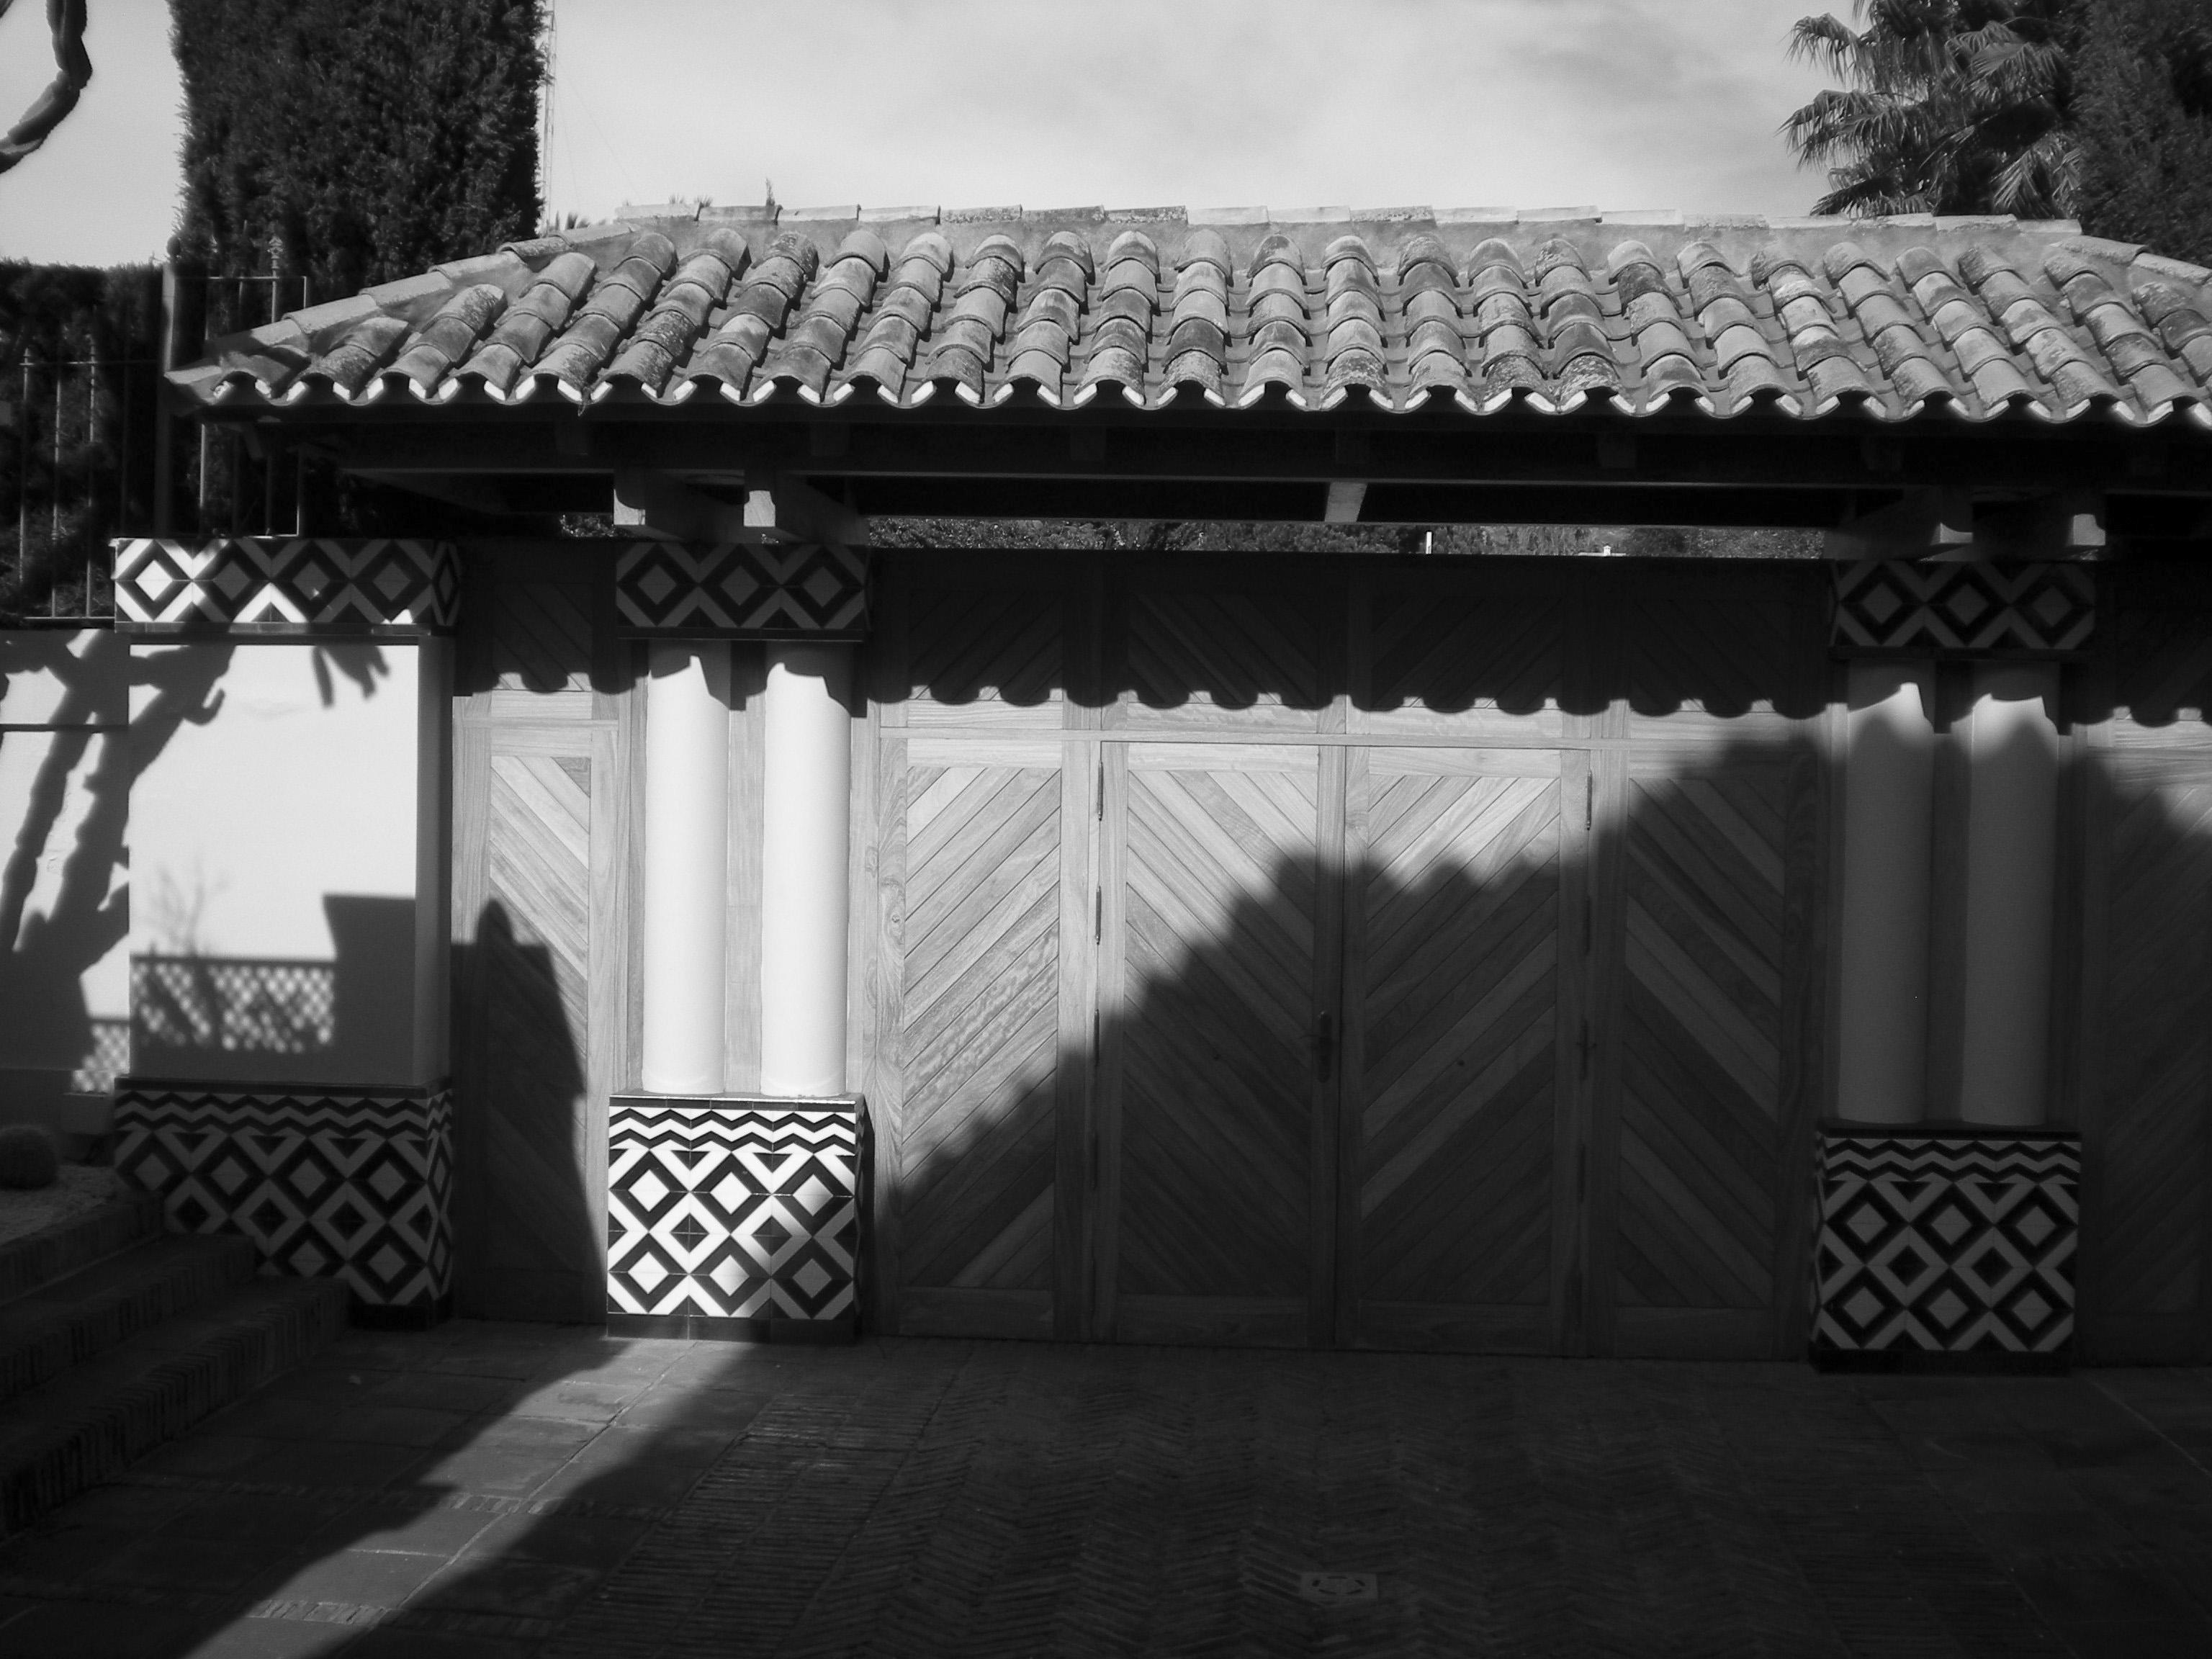 http://tobal.net/wp-content/uploads/2009/08/Los-Verdiales-Anterior-3.jpg